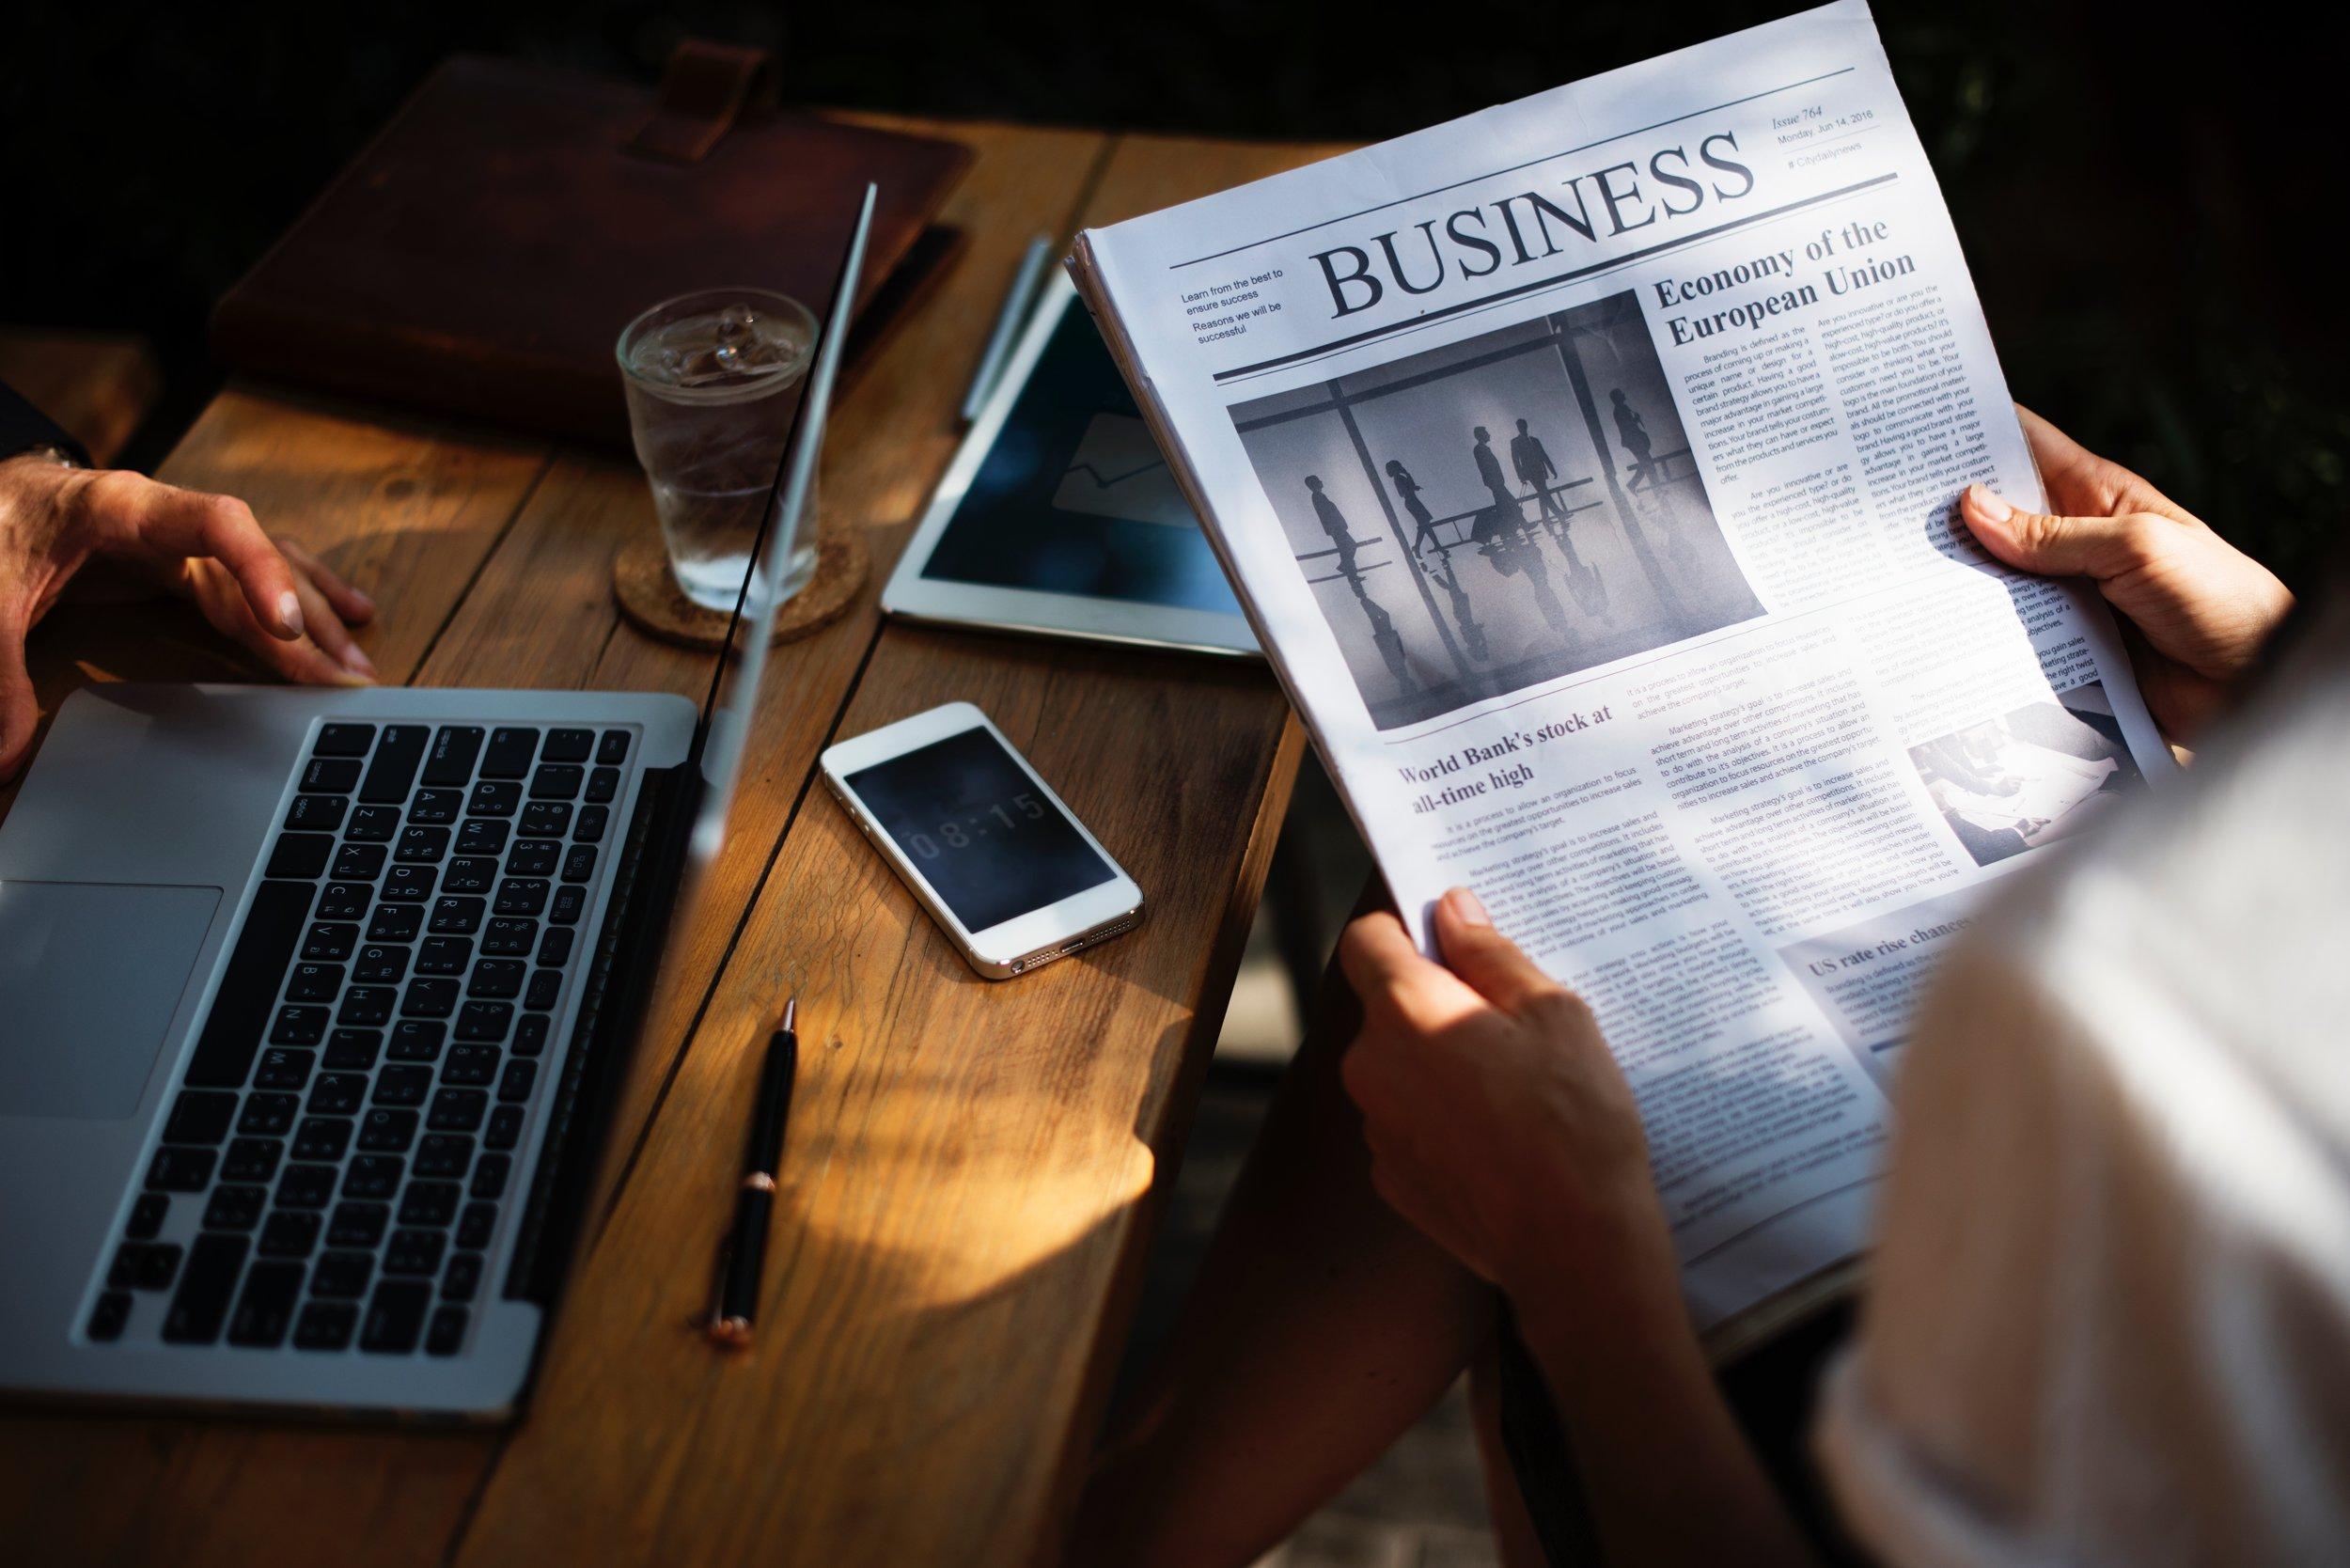 Business & Technology